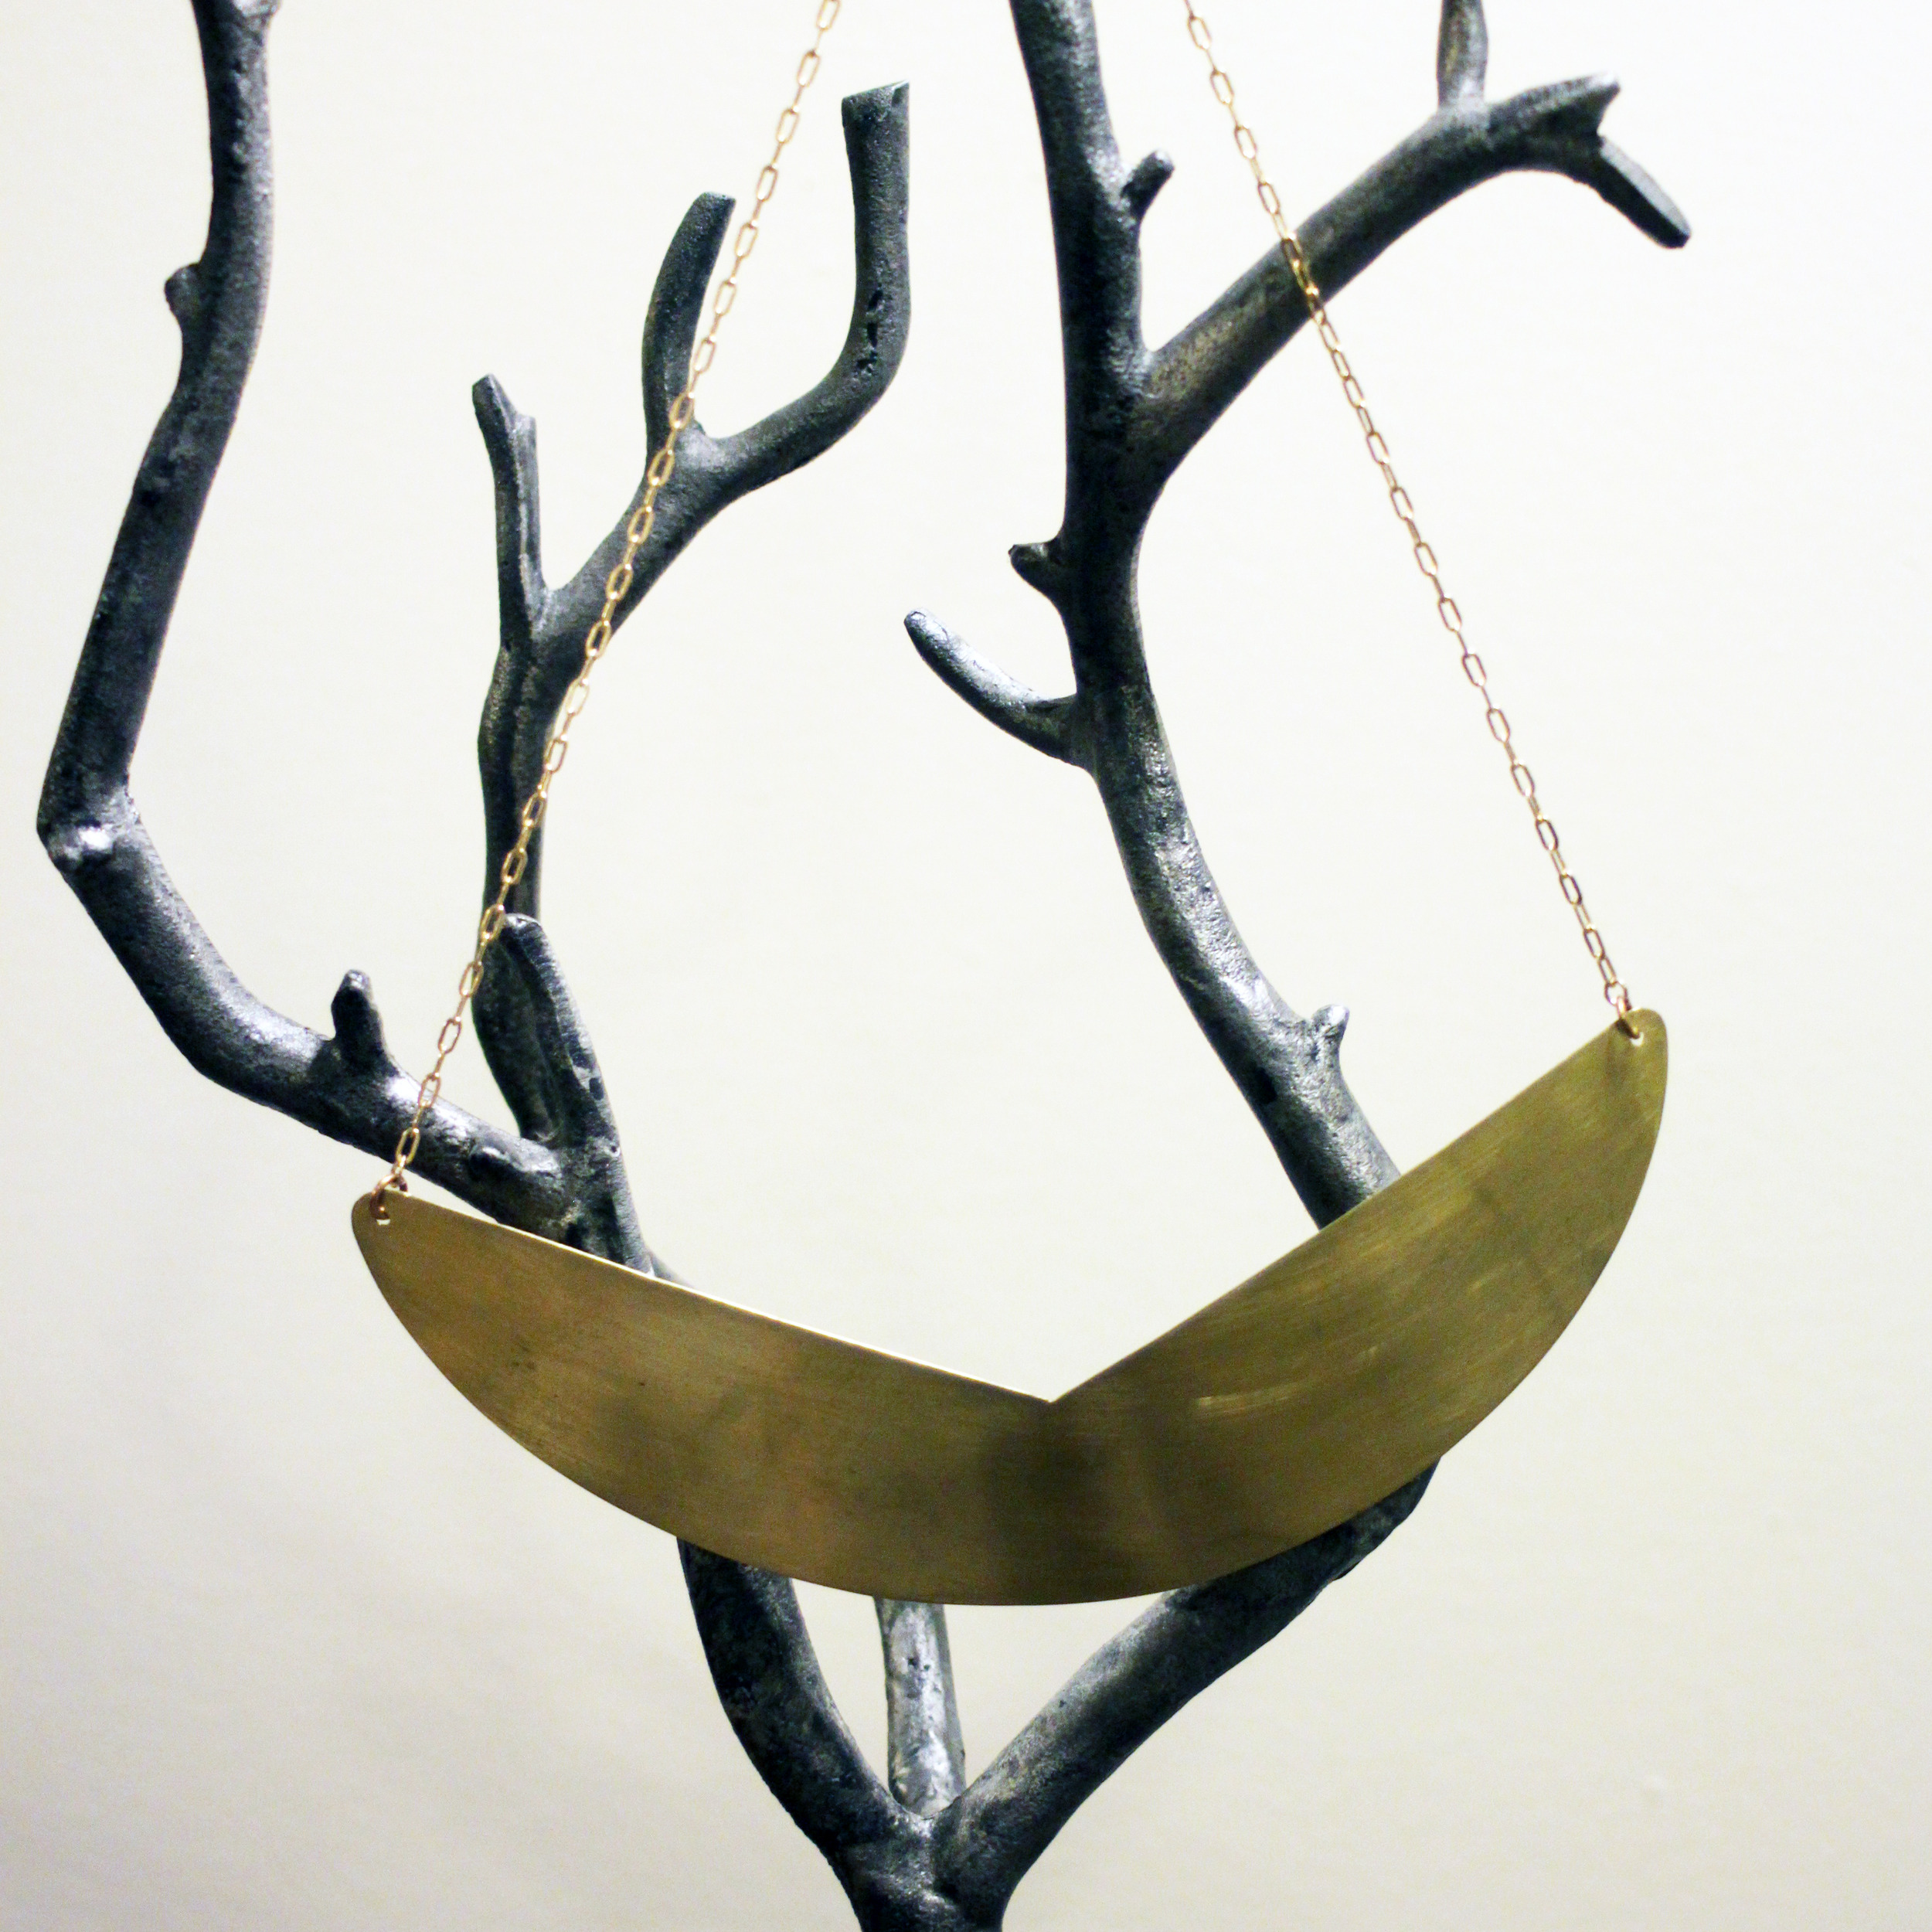 JWM_collar necklace.jpg